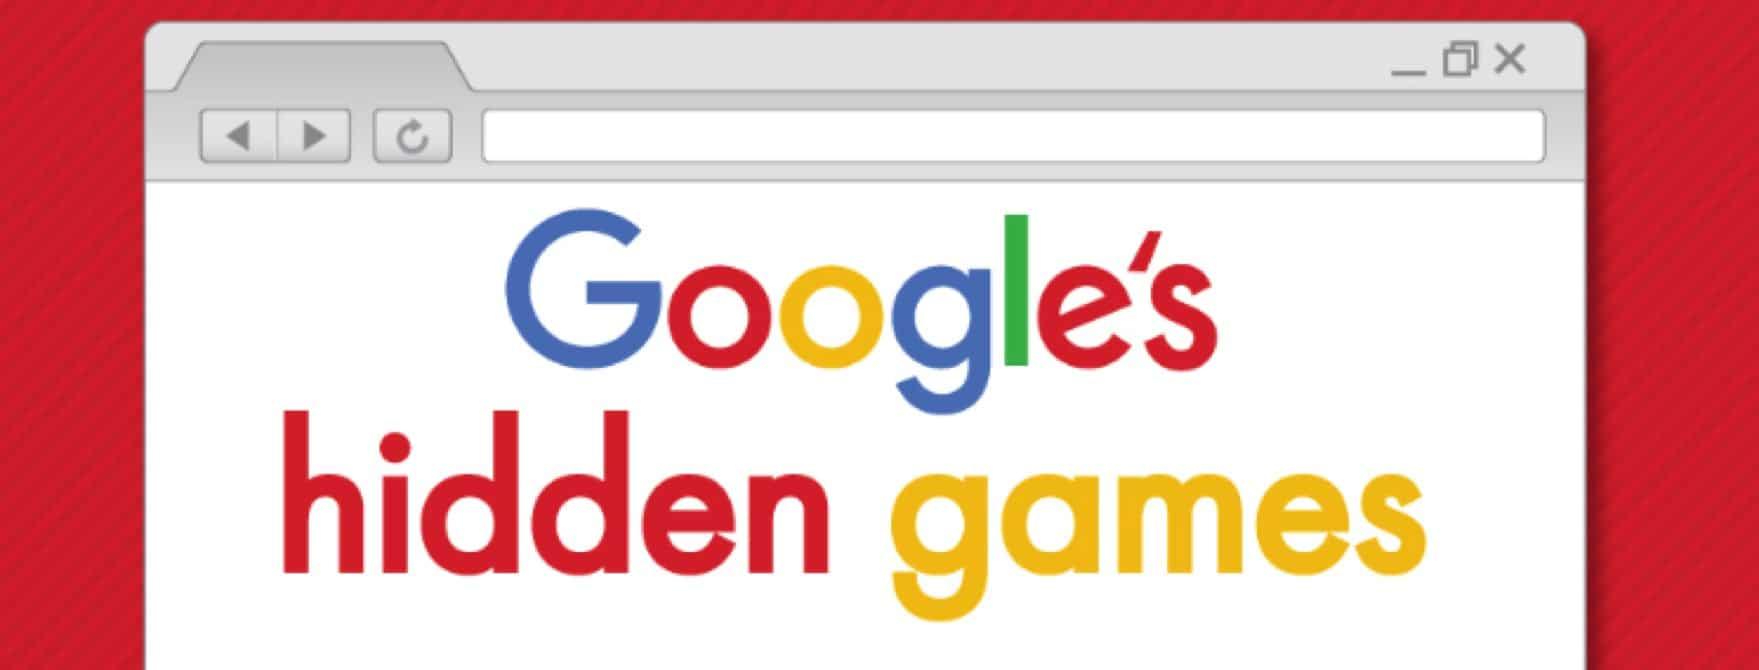 Google Hidden Games